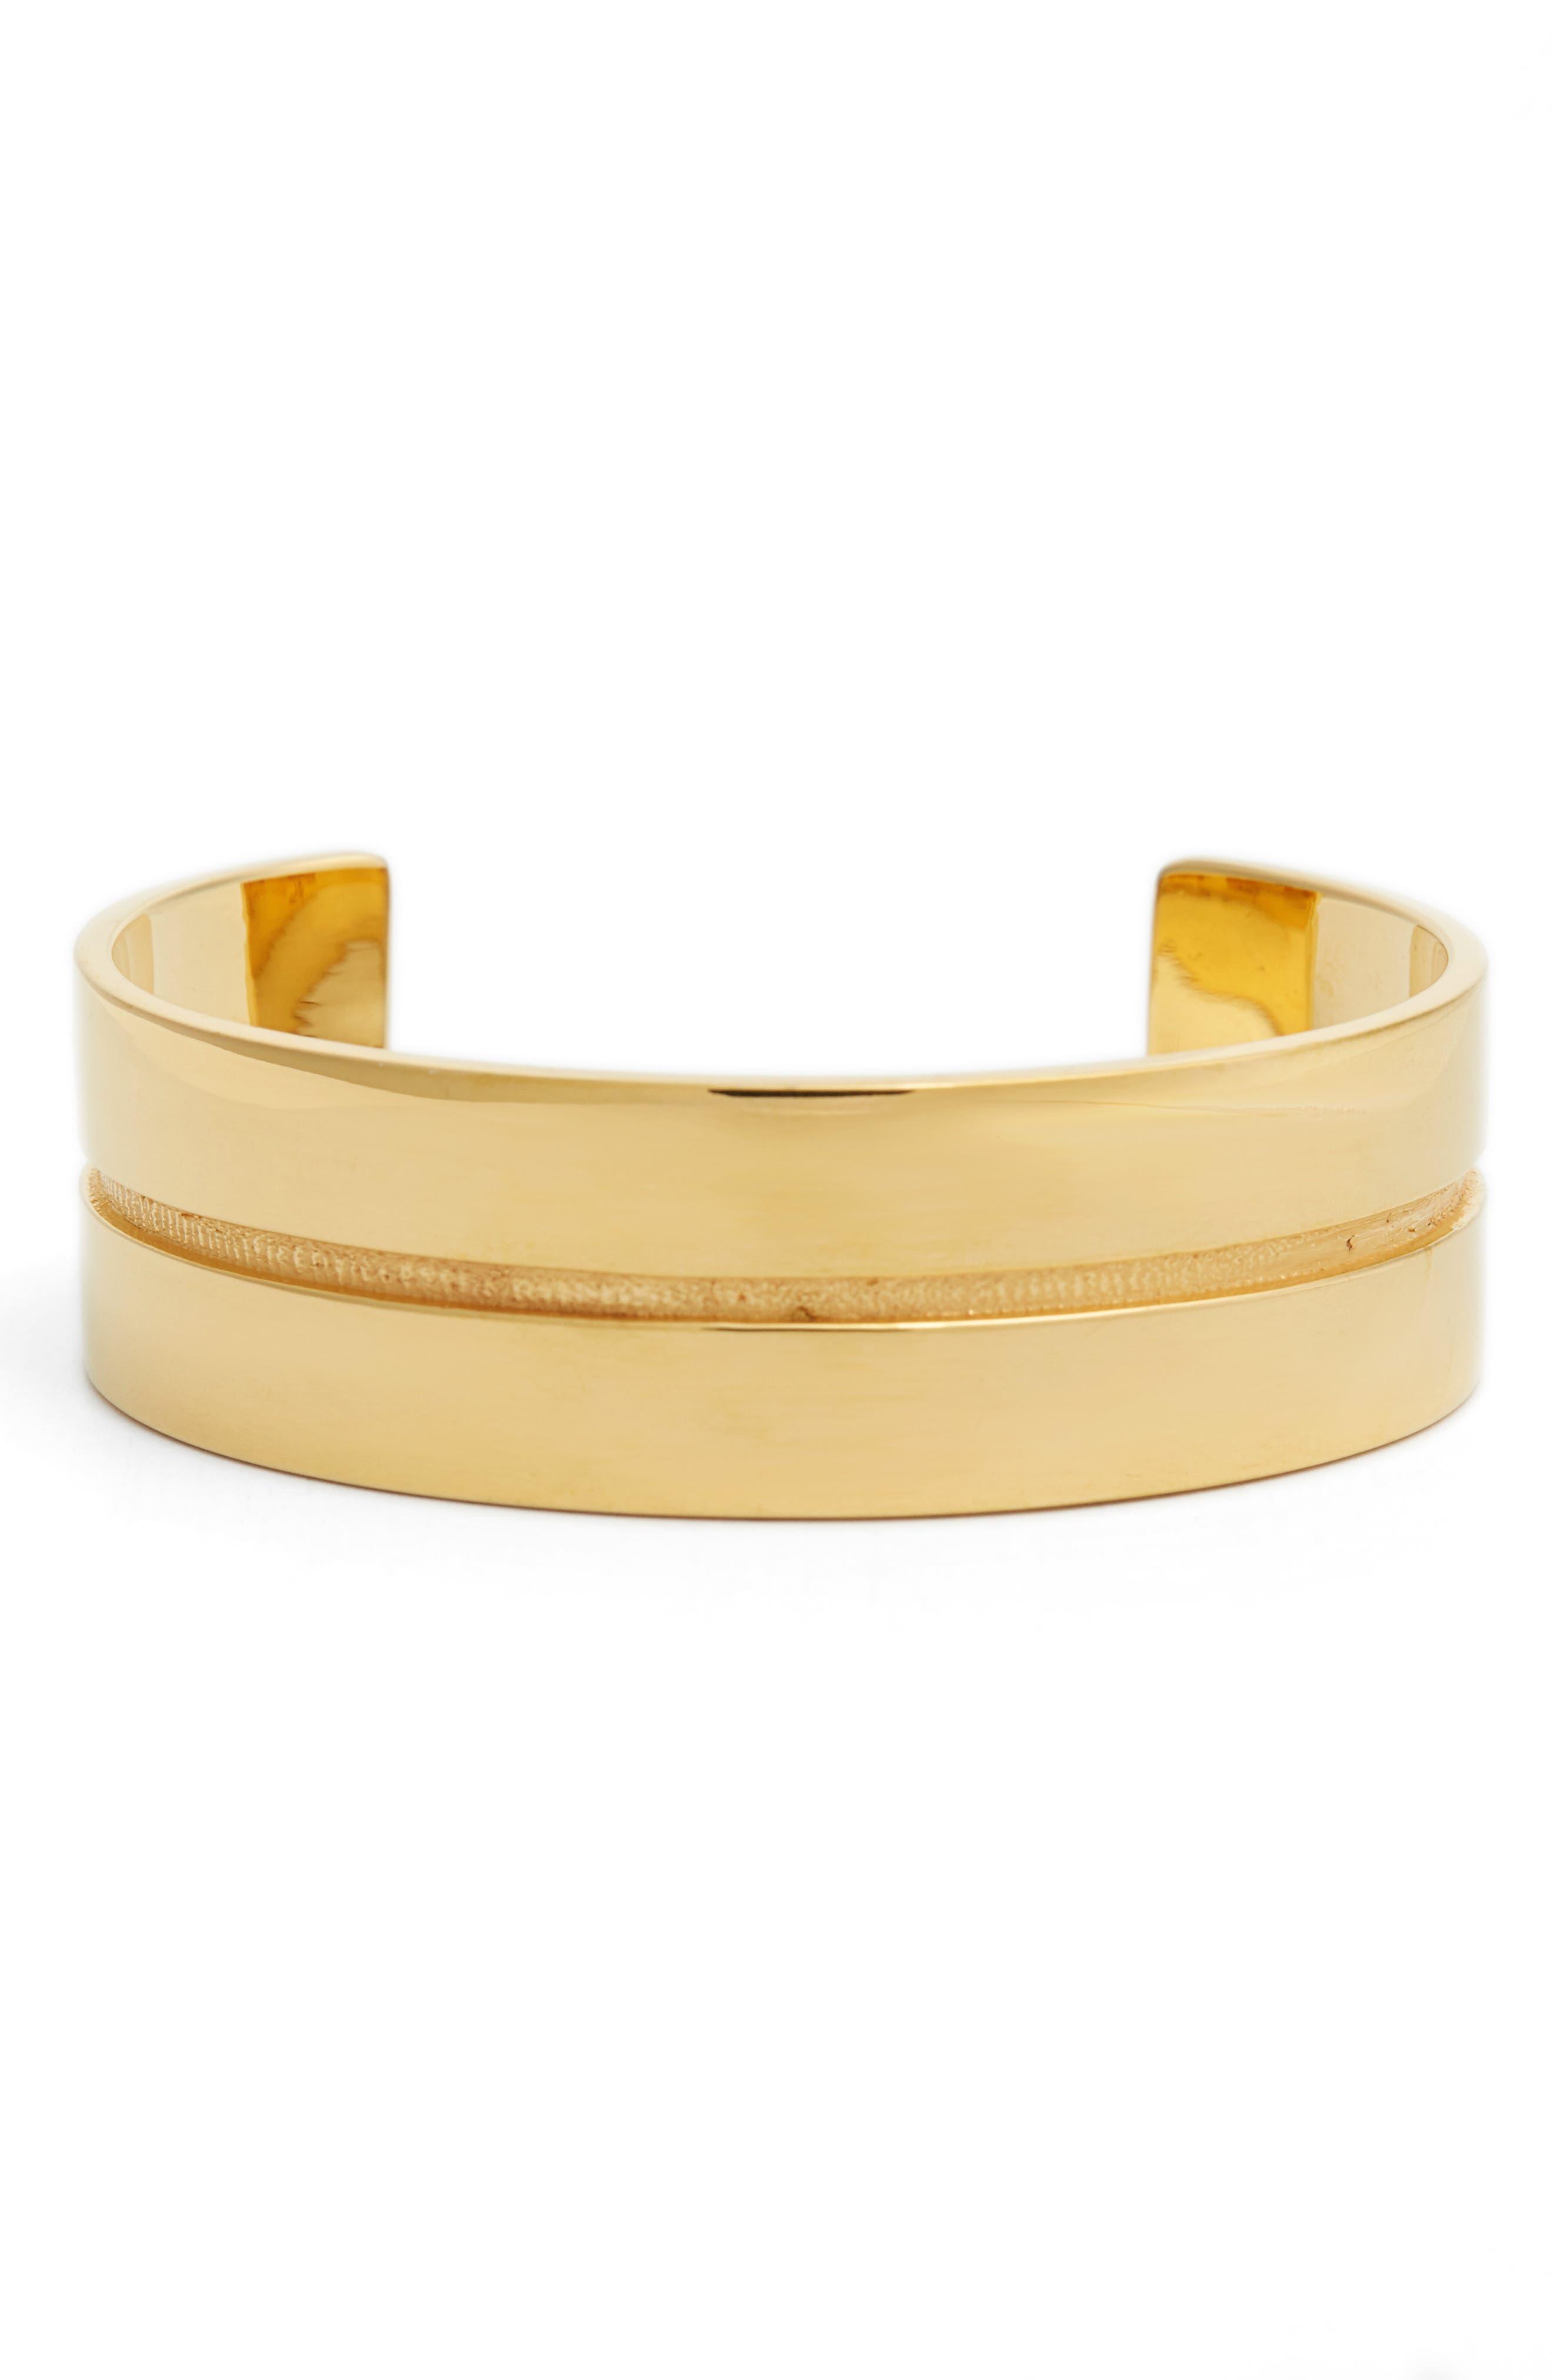 Mapplethorpe 2 Vermeil Cuff Bracelet,                         Main,                         color,